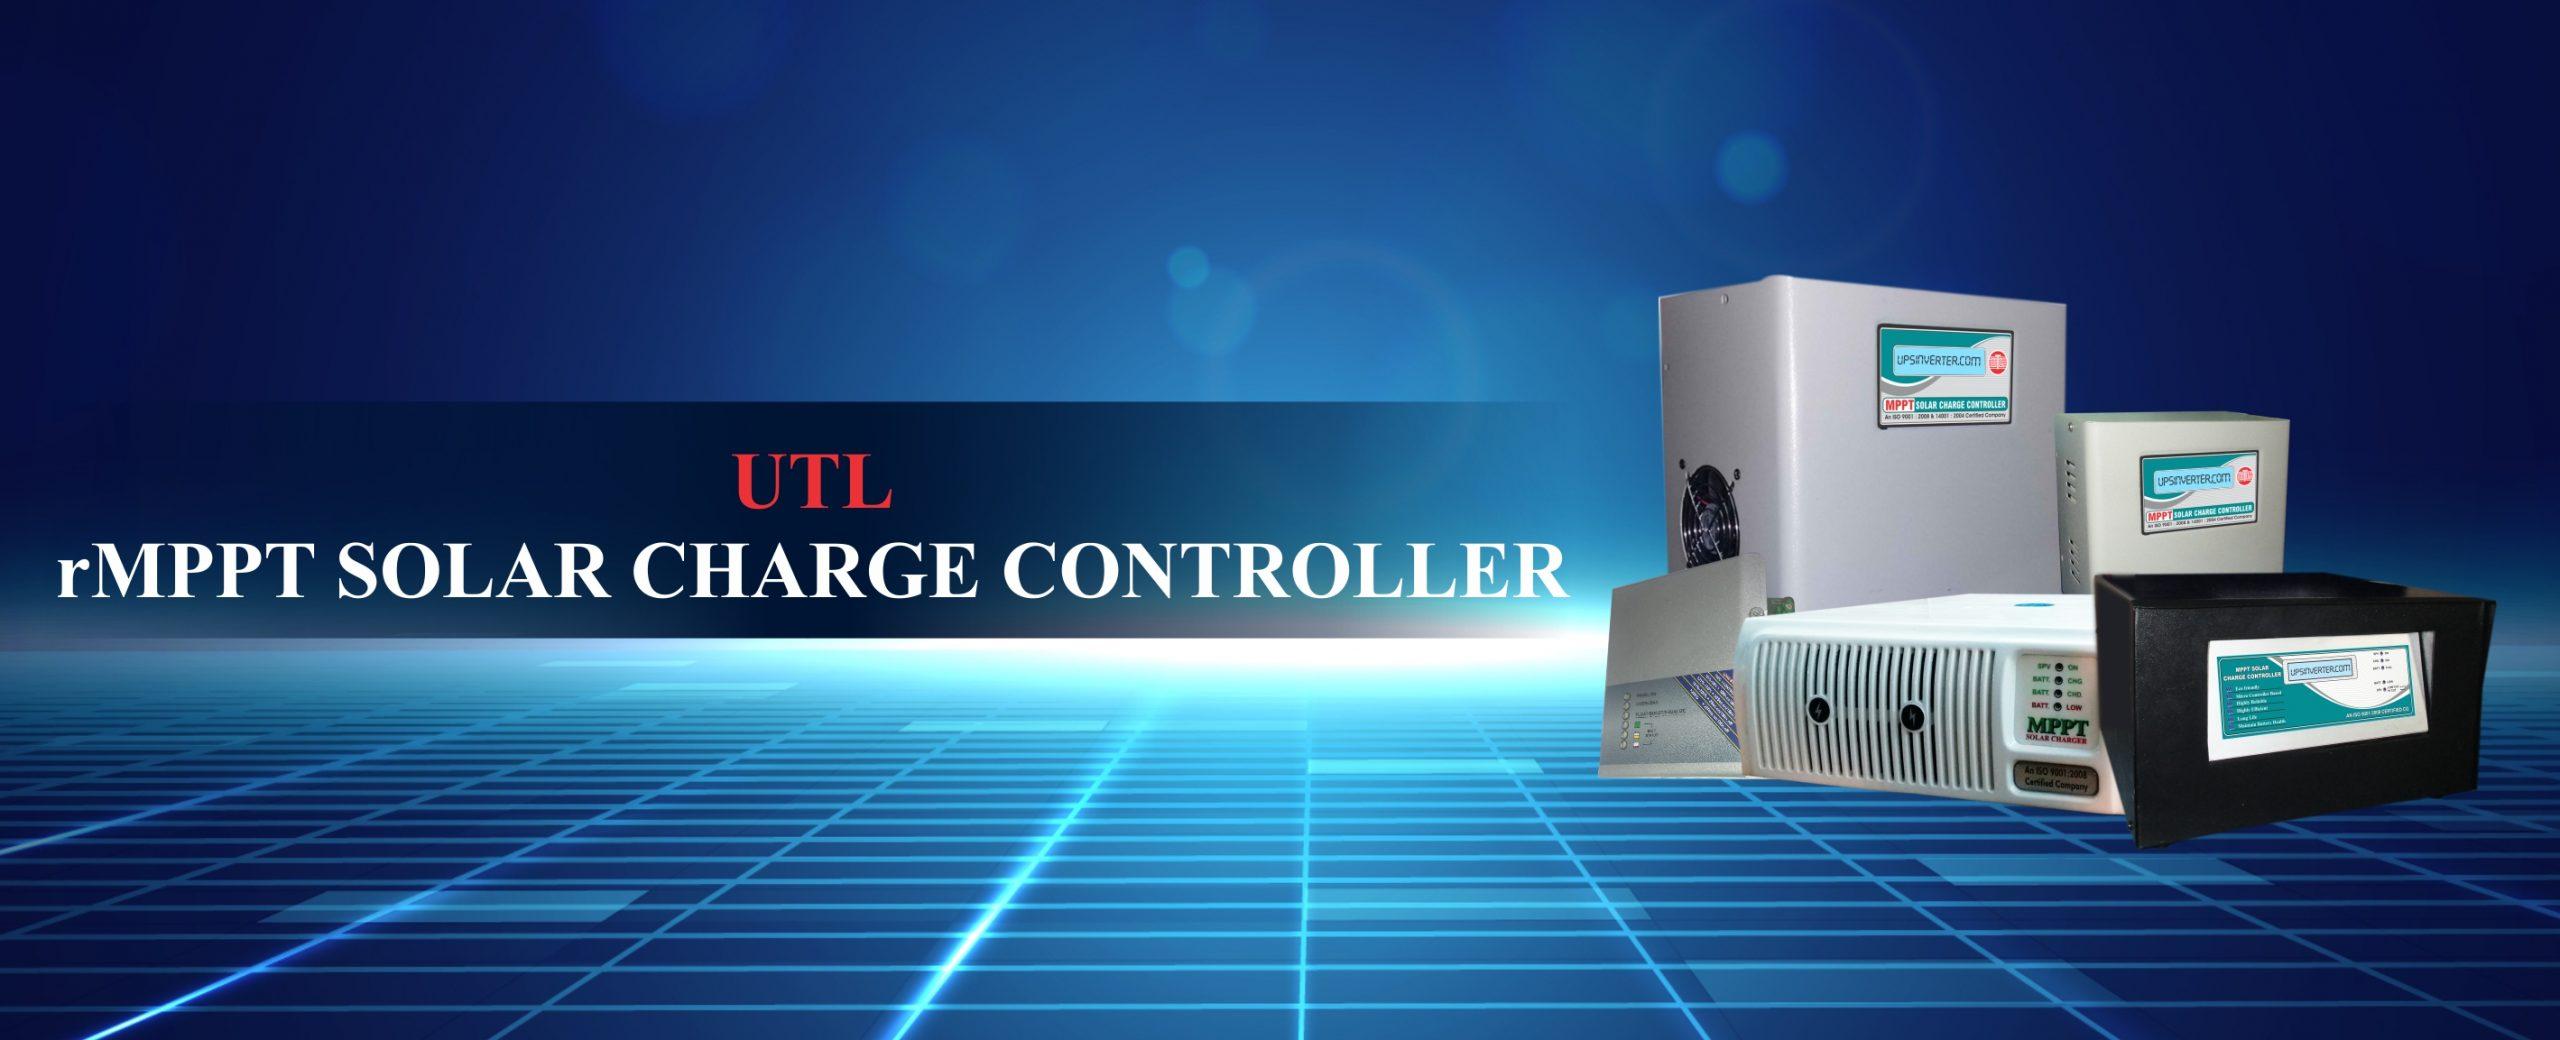 UTL MPPT Solar Charge Controller